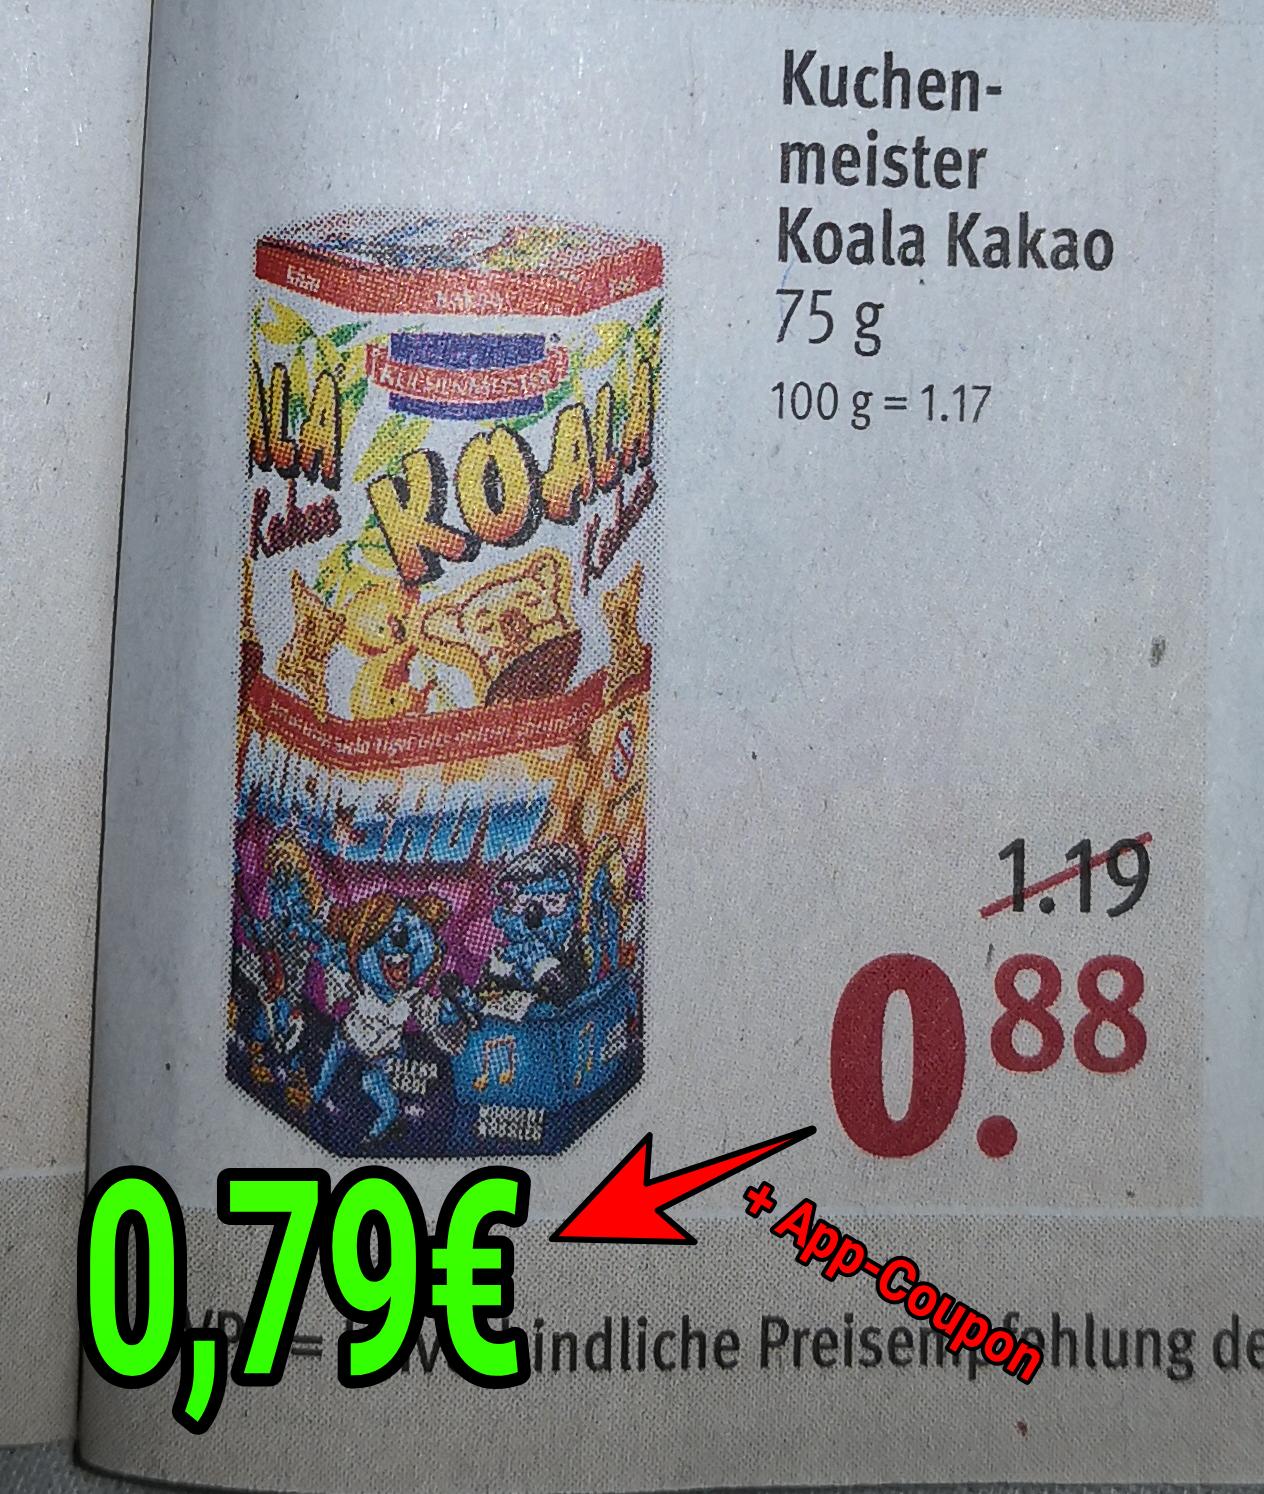 Kuchenmeister Koala Kakao, Weider Yippie! Protein Riegel, Treets, Prinzen Rolle & Lachgummi [Rossmann + Coupon]